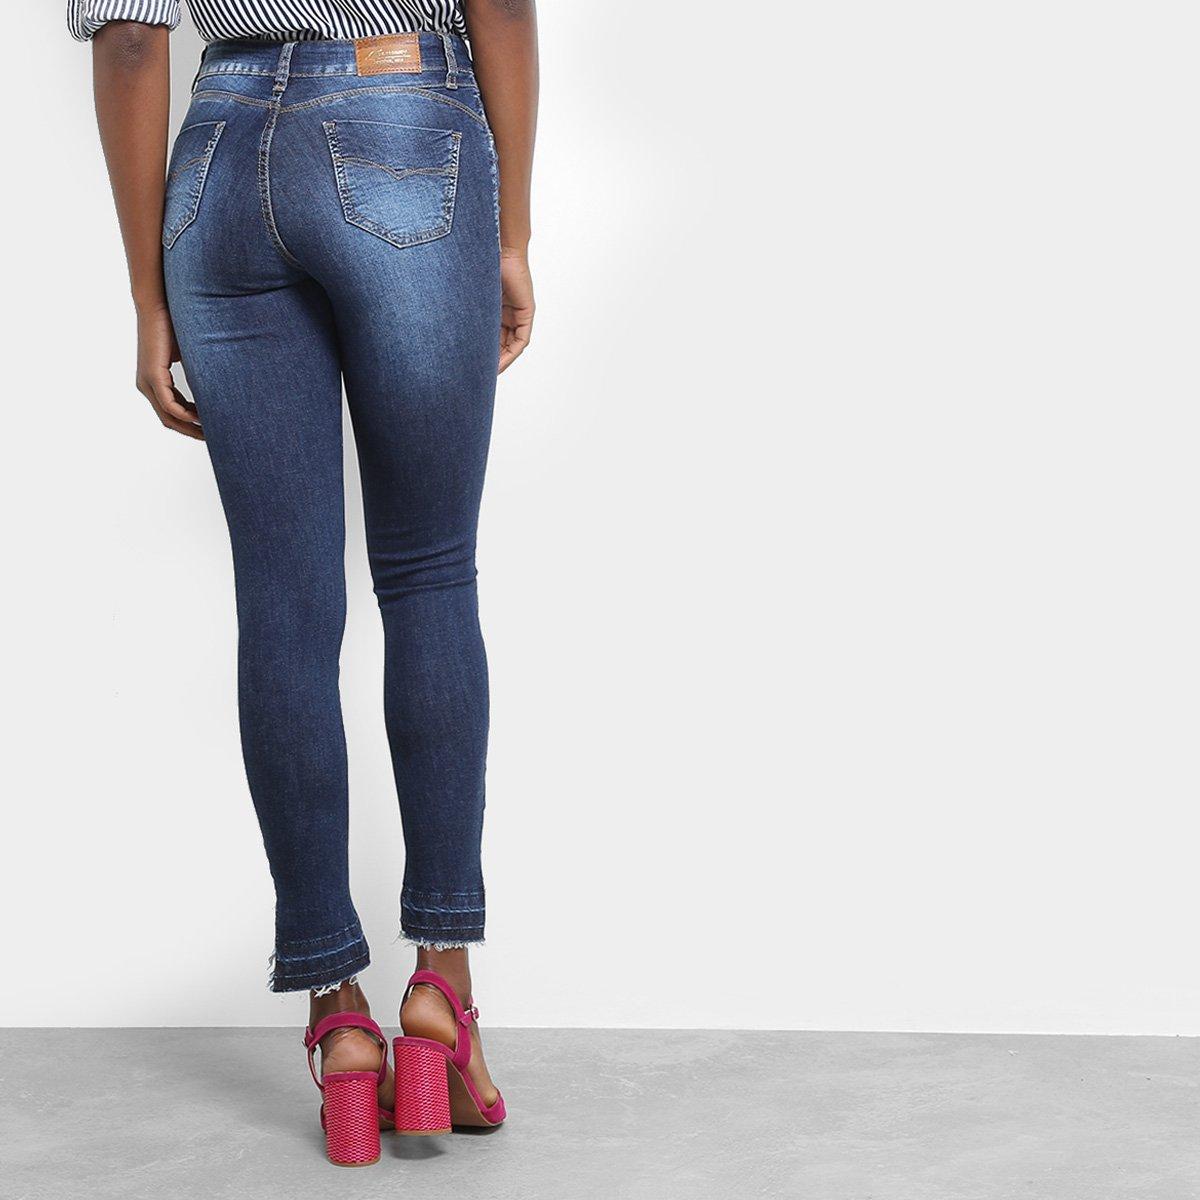 5c9c9daae Calça Jeans Skinny Sawary Estonada Barra Assimétrica Cintura Média ...